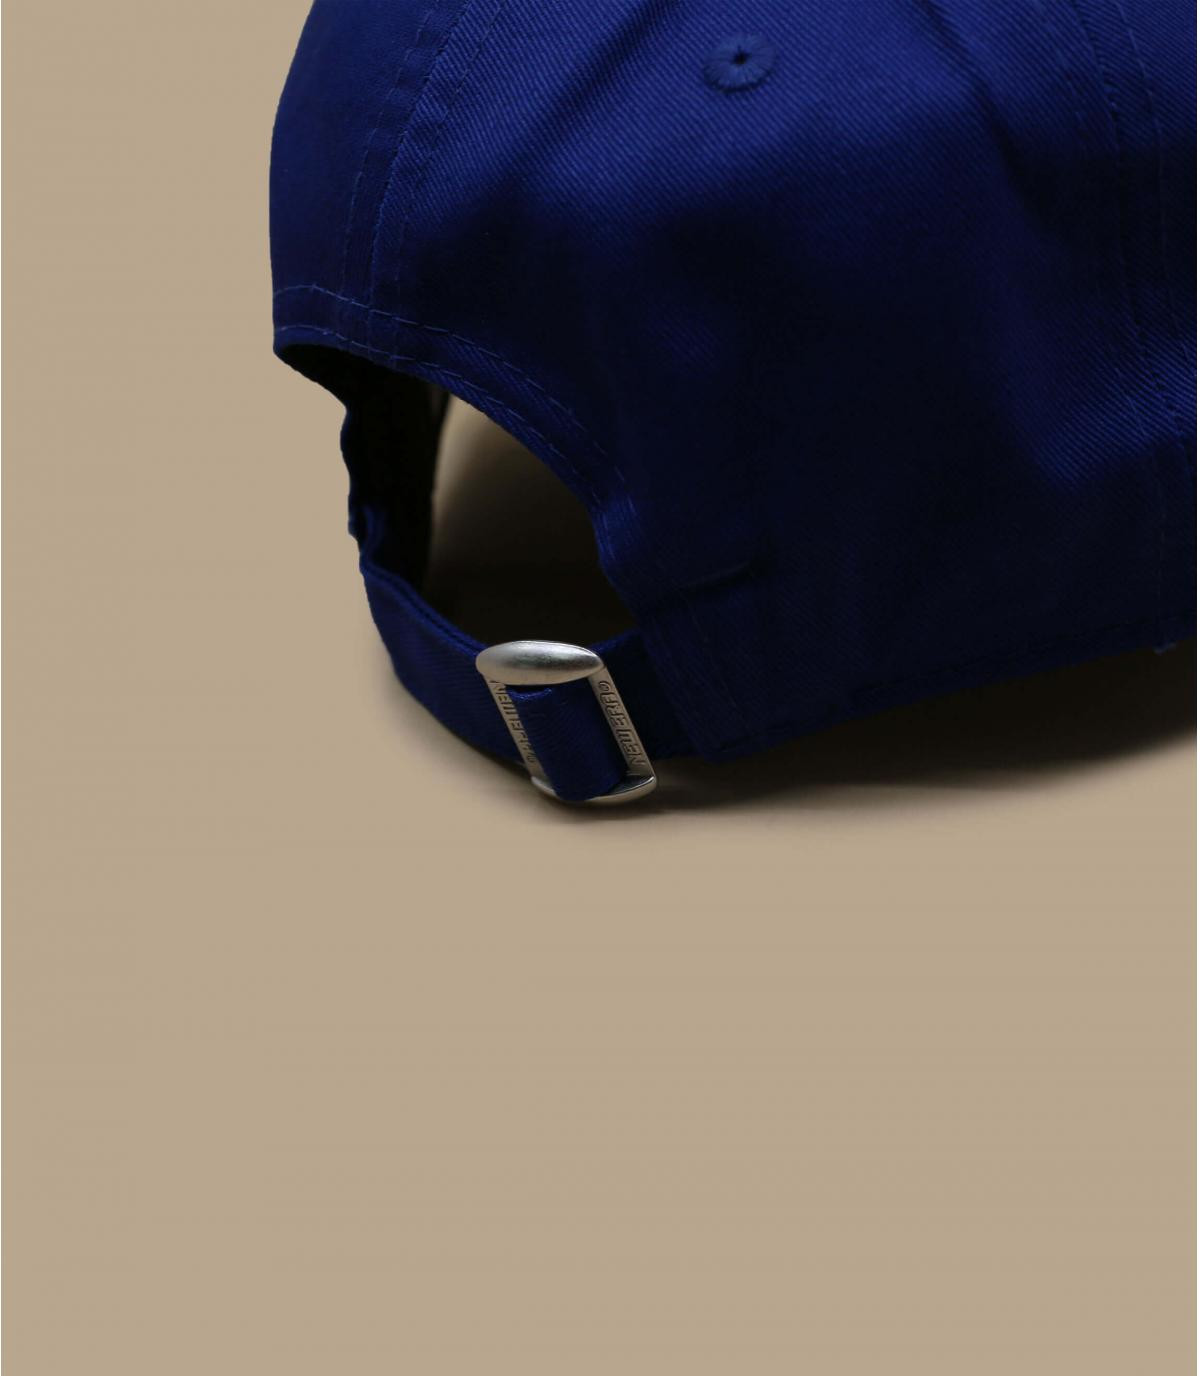 ... azul gorra New Era - Basic Cap royal white New Era imagen 4 ... 78936289b6f